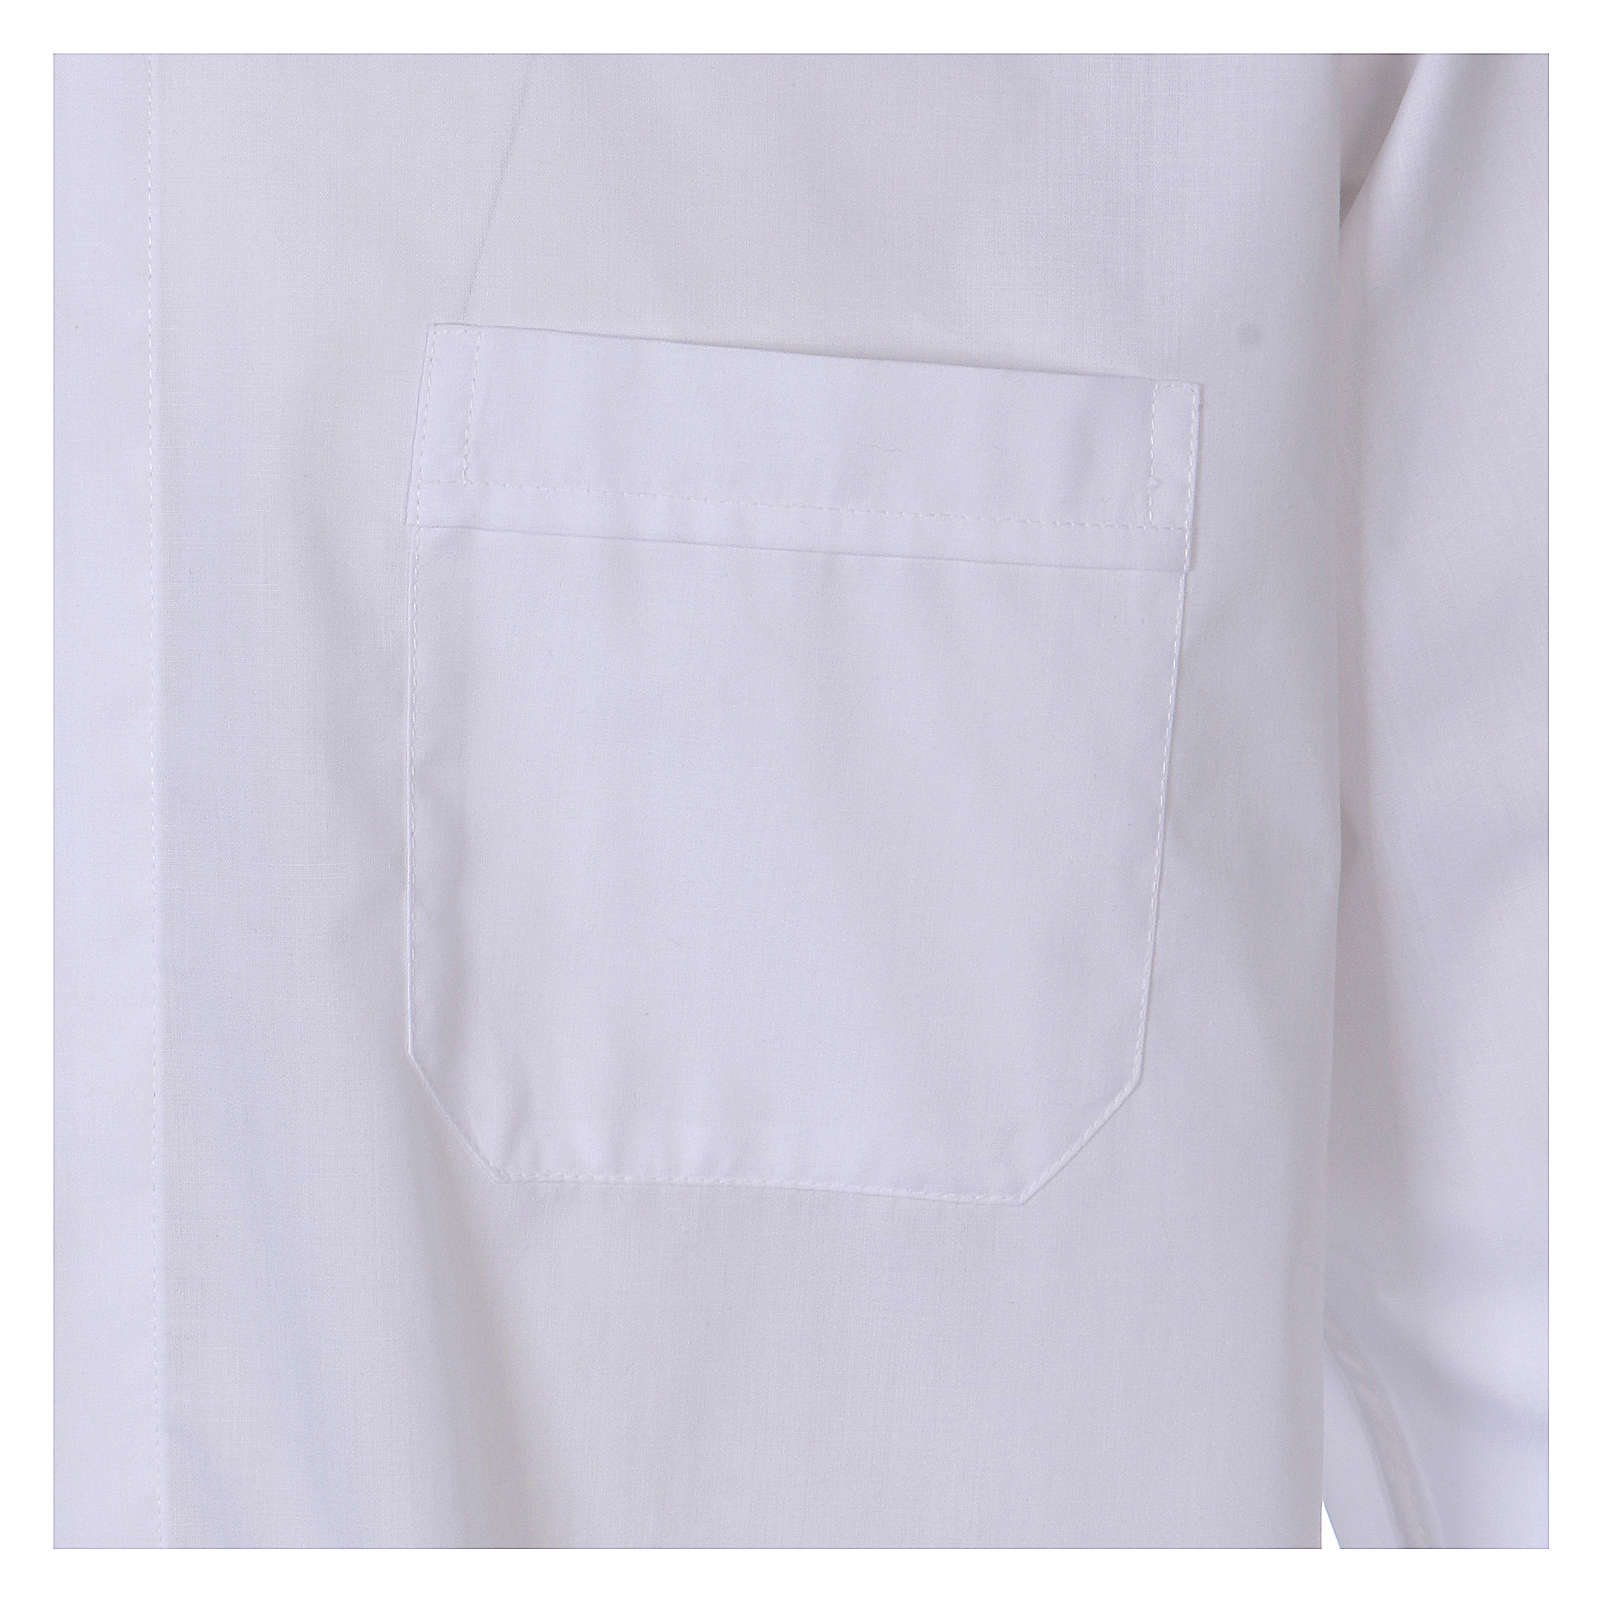 Camisa cuello Clergy manga larga mixto algodón blanca 4